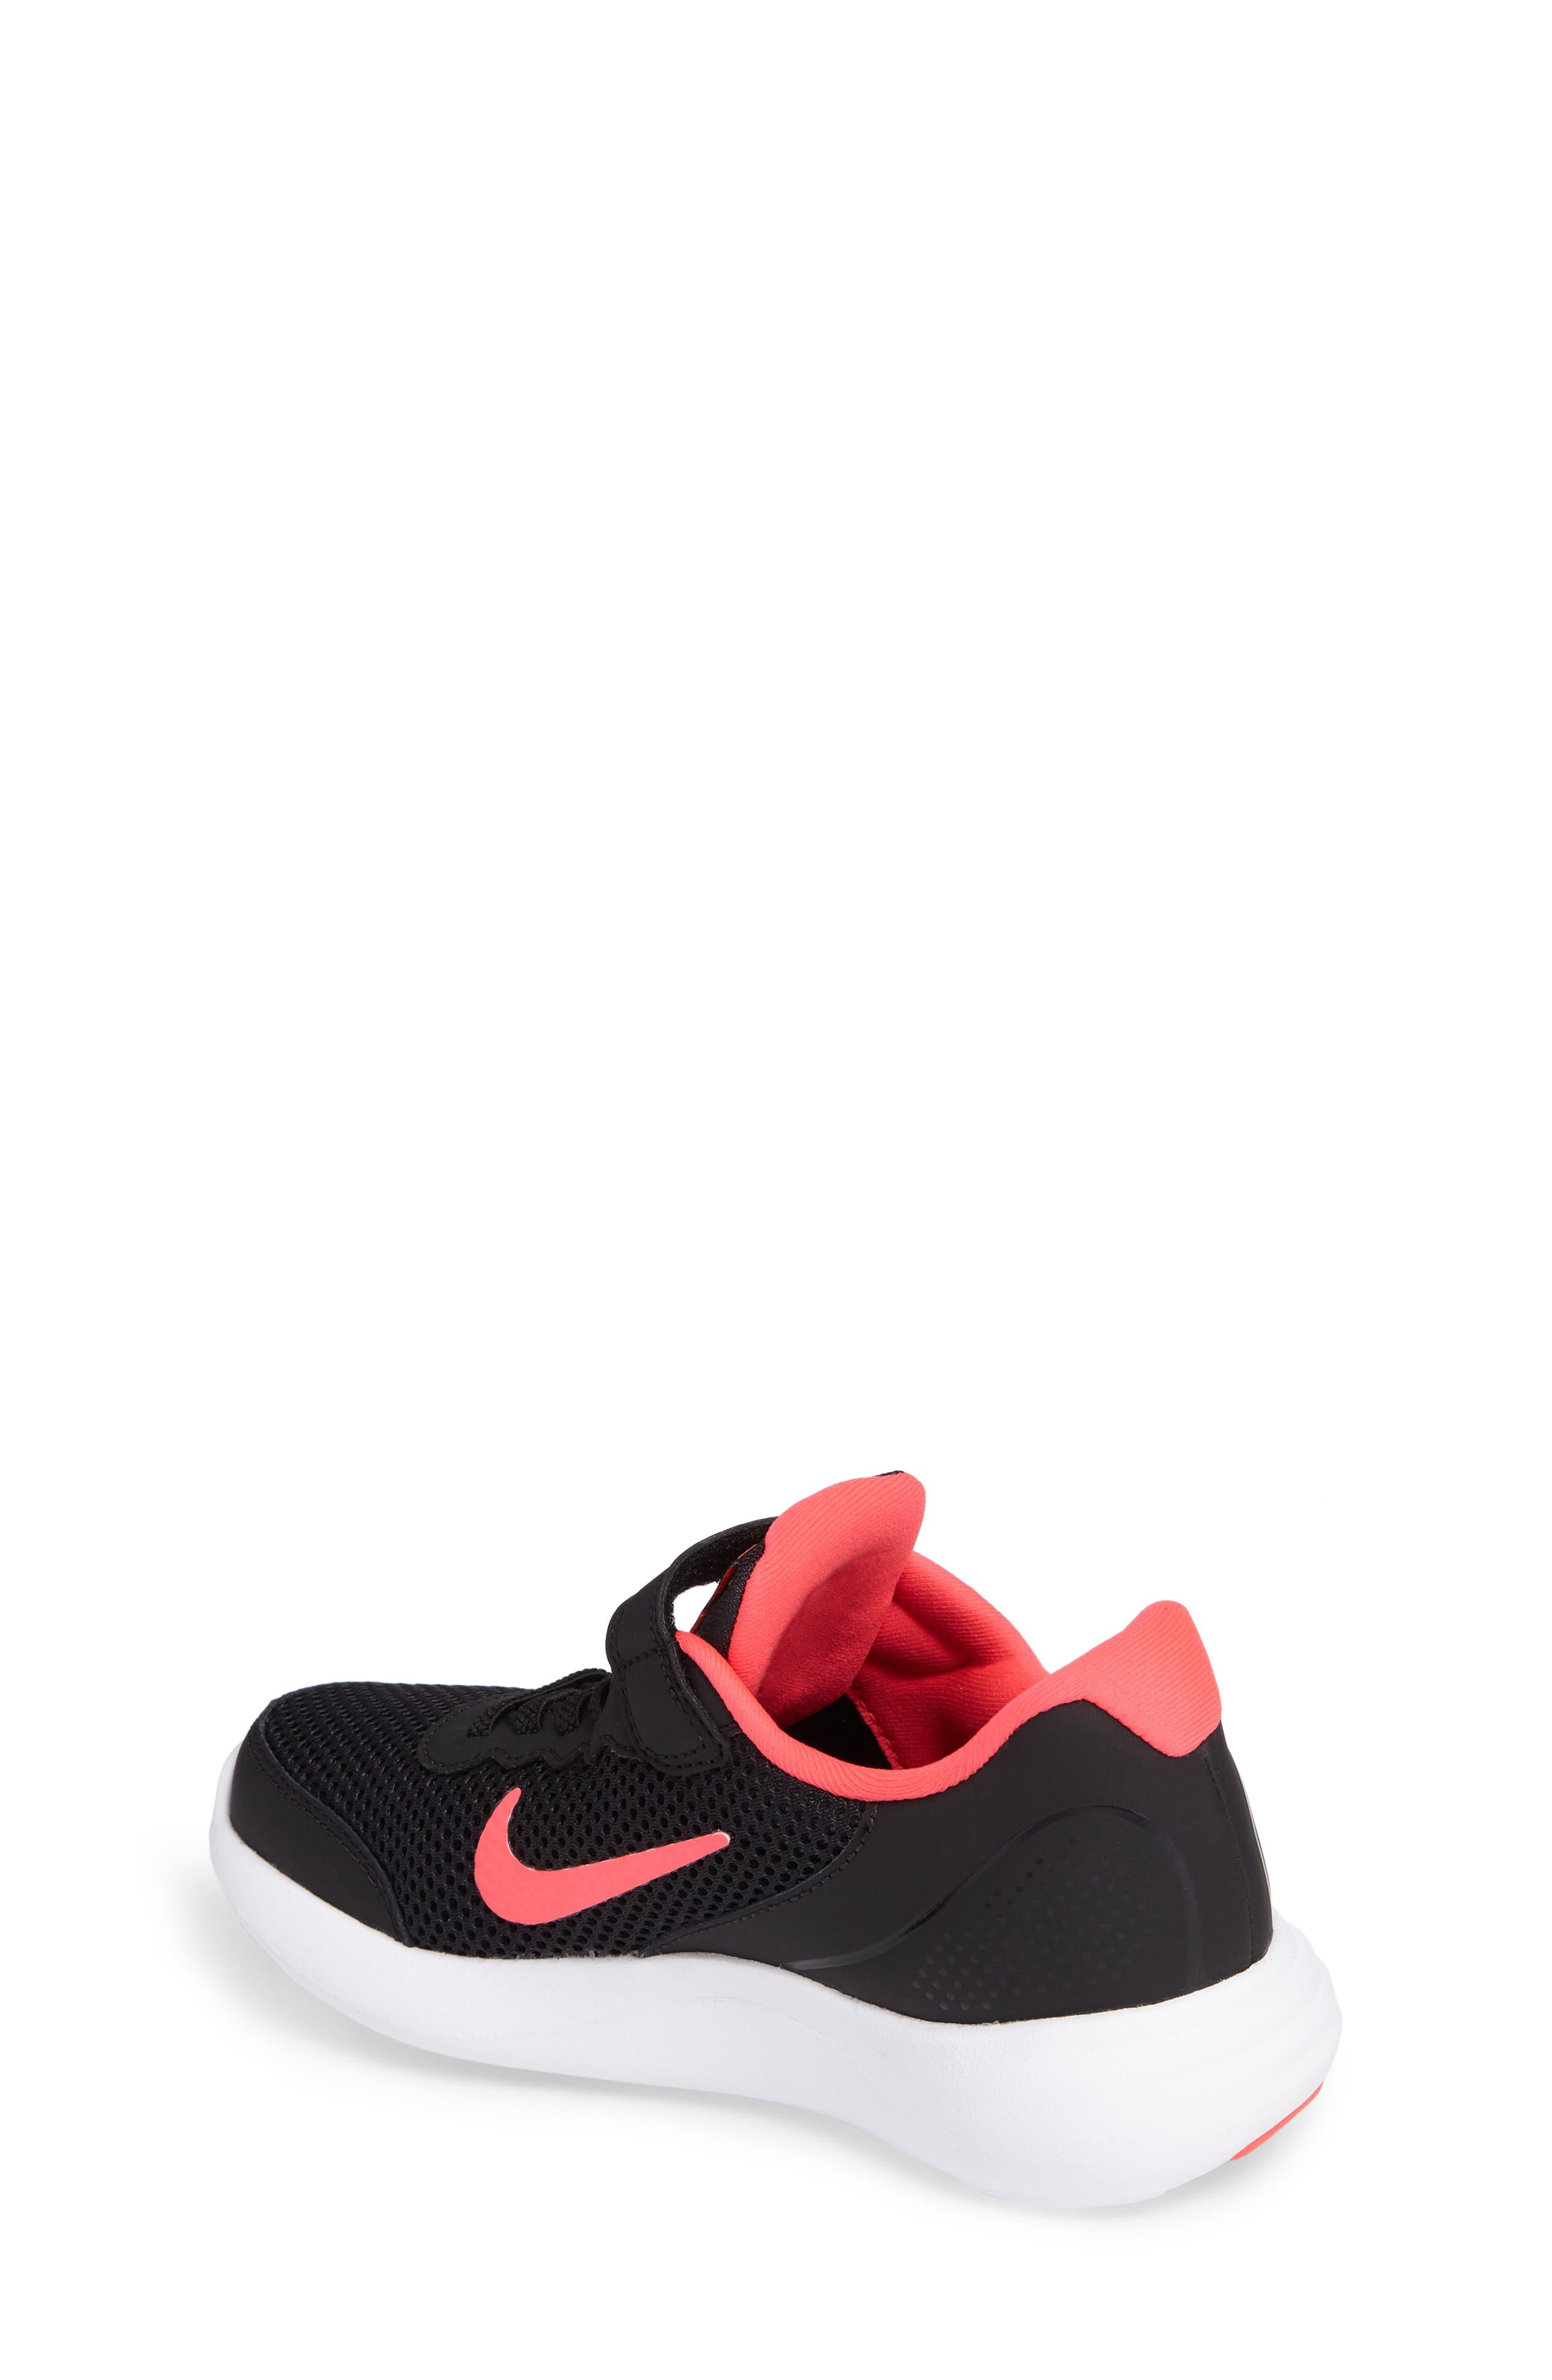 Lunar Apparent Sneaker,                             Alternate thumbnail 2, color,                             Black/ Racer Pink/ White